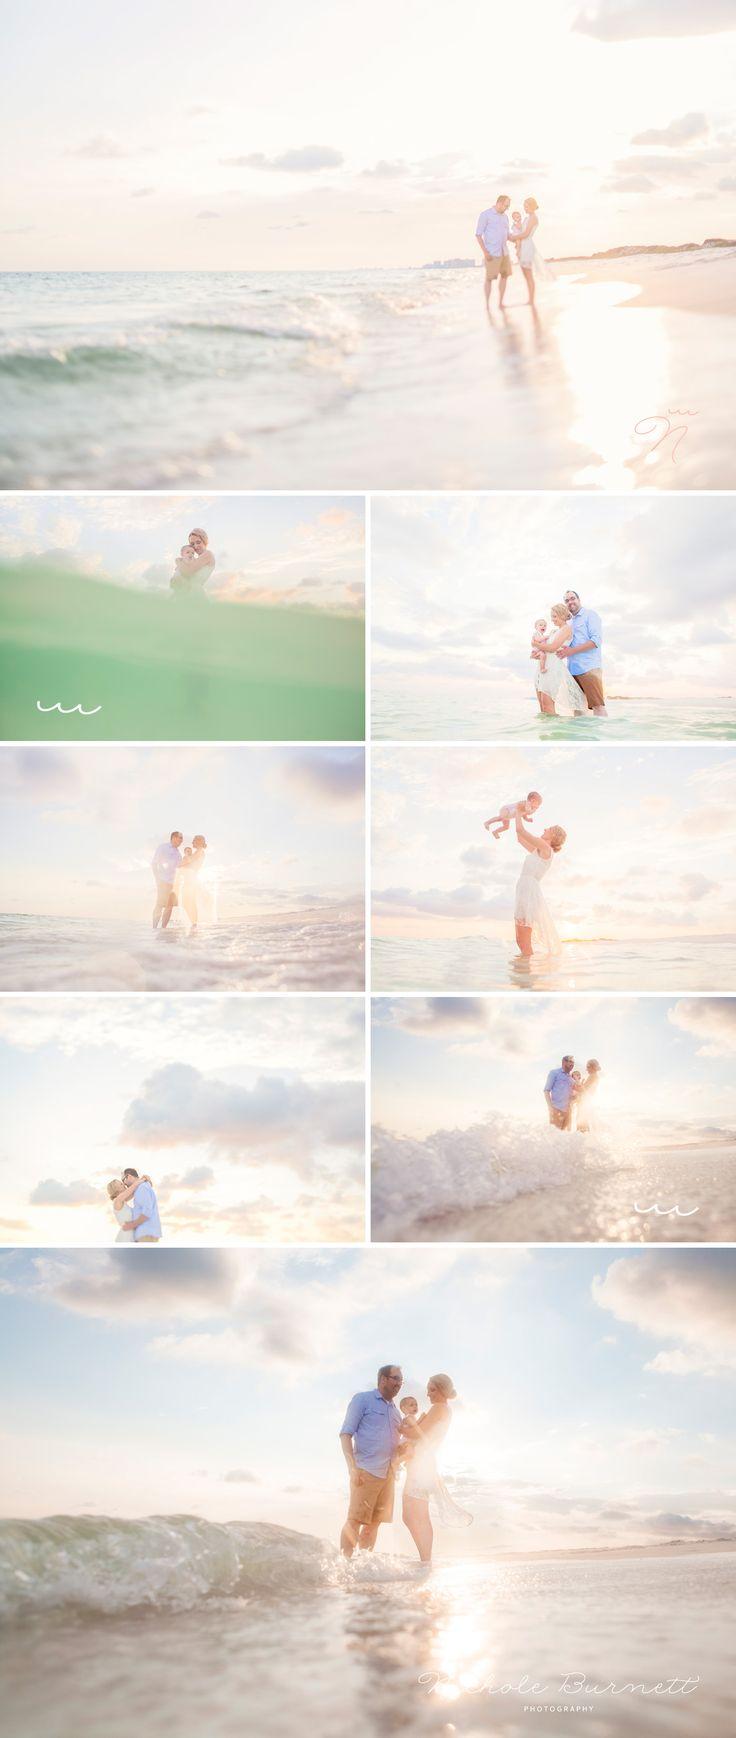 Beach Photographer in Santa Rosa Beach   Water and Light   Beach Photo Inspiration  Family